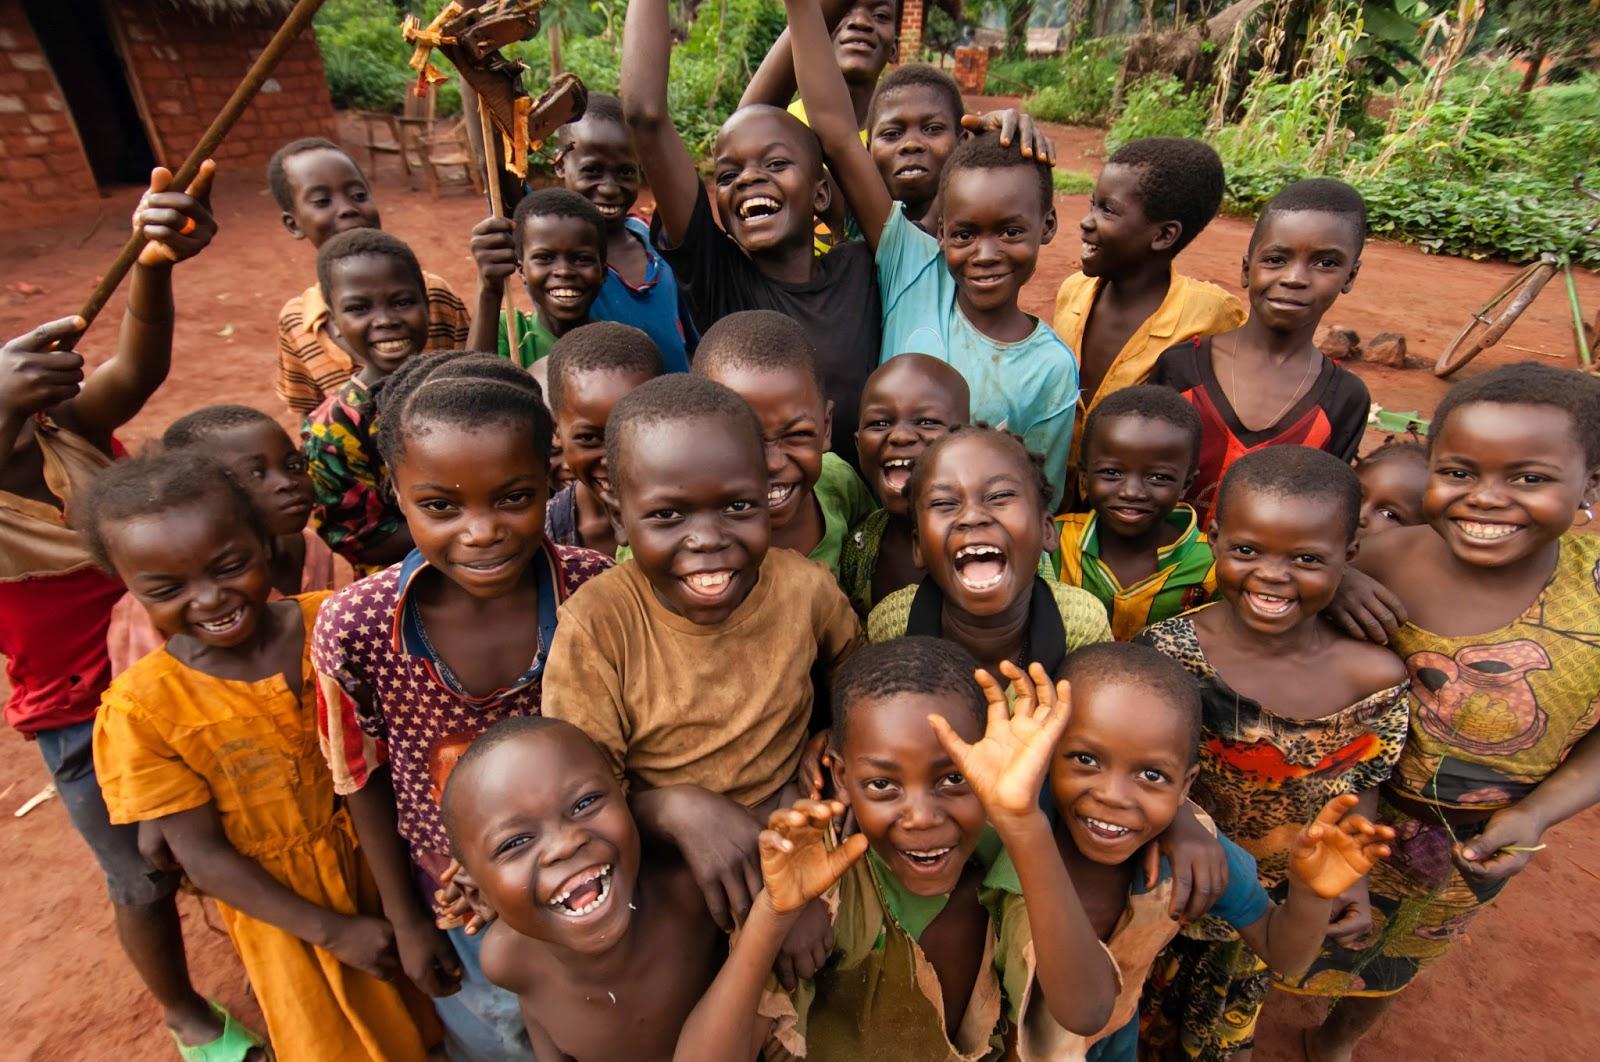 tribe kids african kids